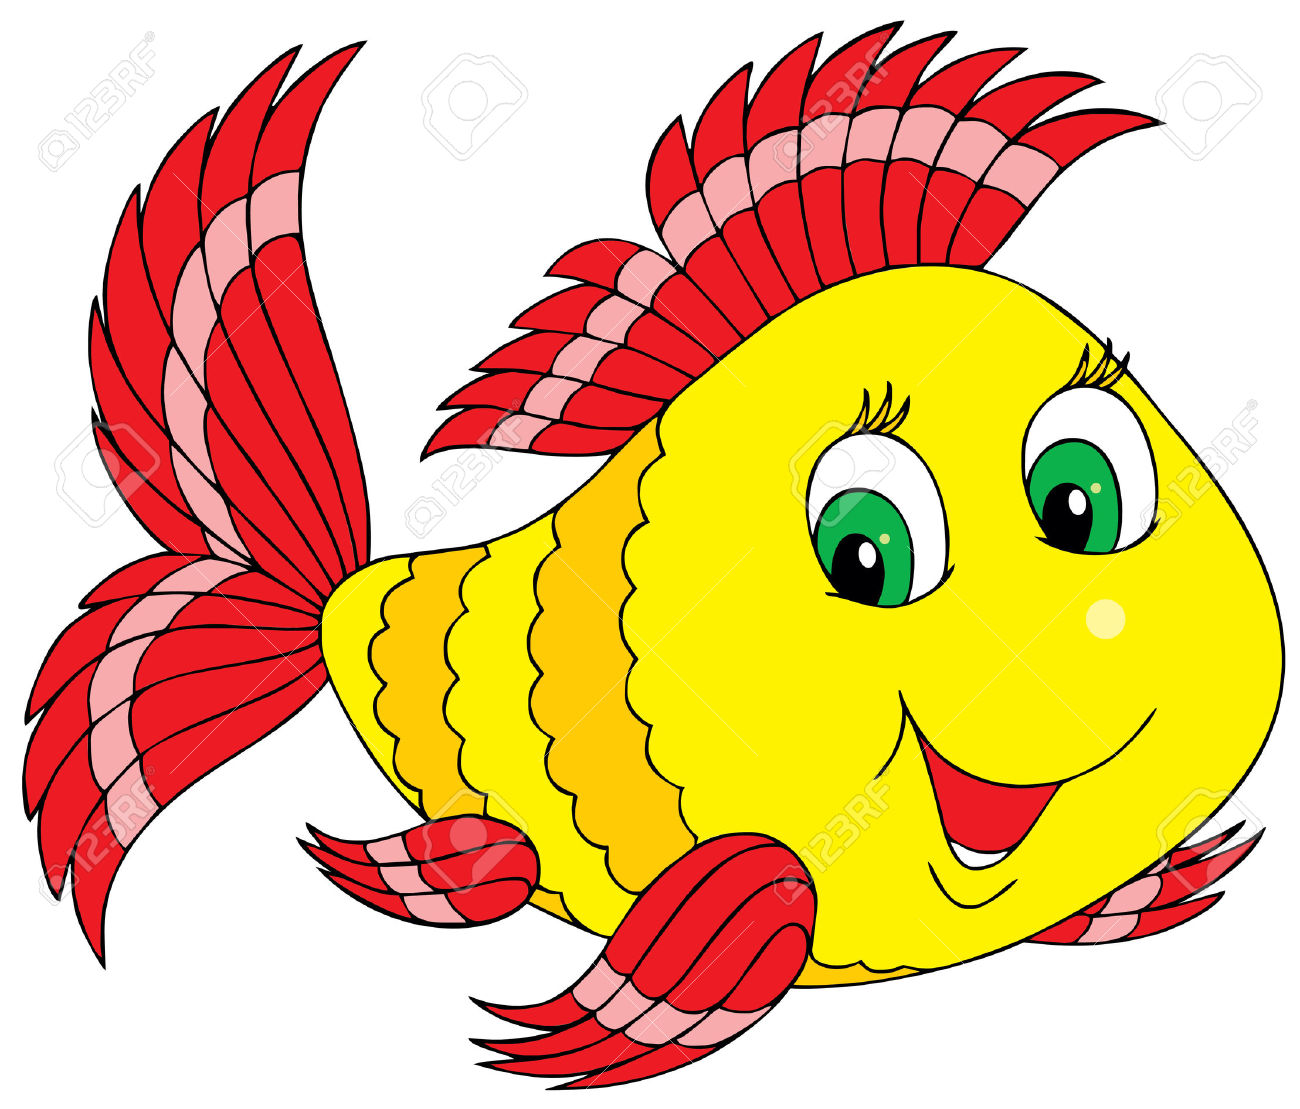 Blue Fish Fish Clip Art Free-Blue fish fish clip art free-2